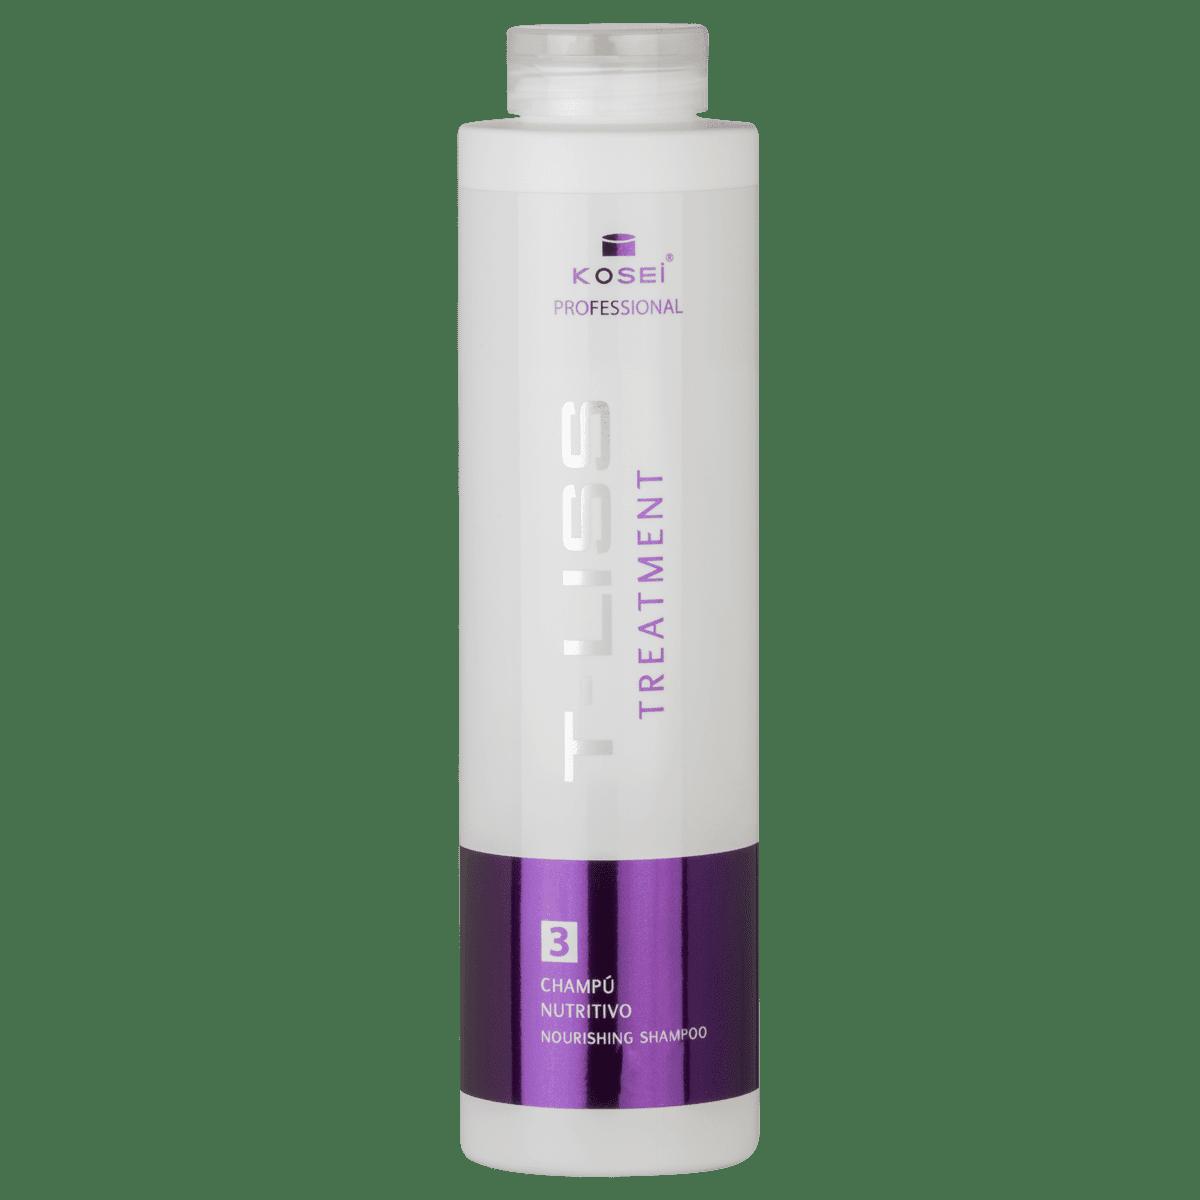 kosei-tliss-champú-nutritivo-keratina-500-ml